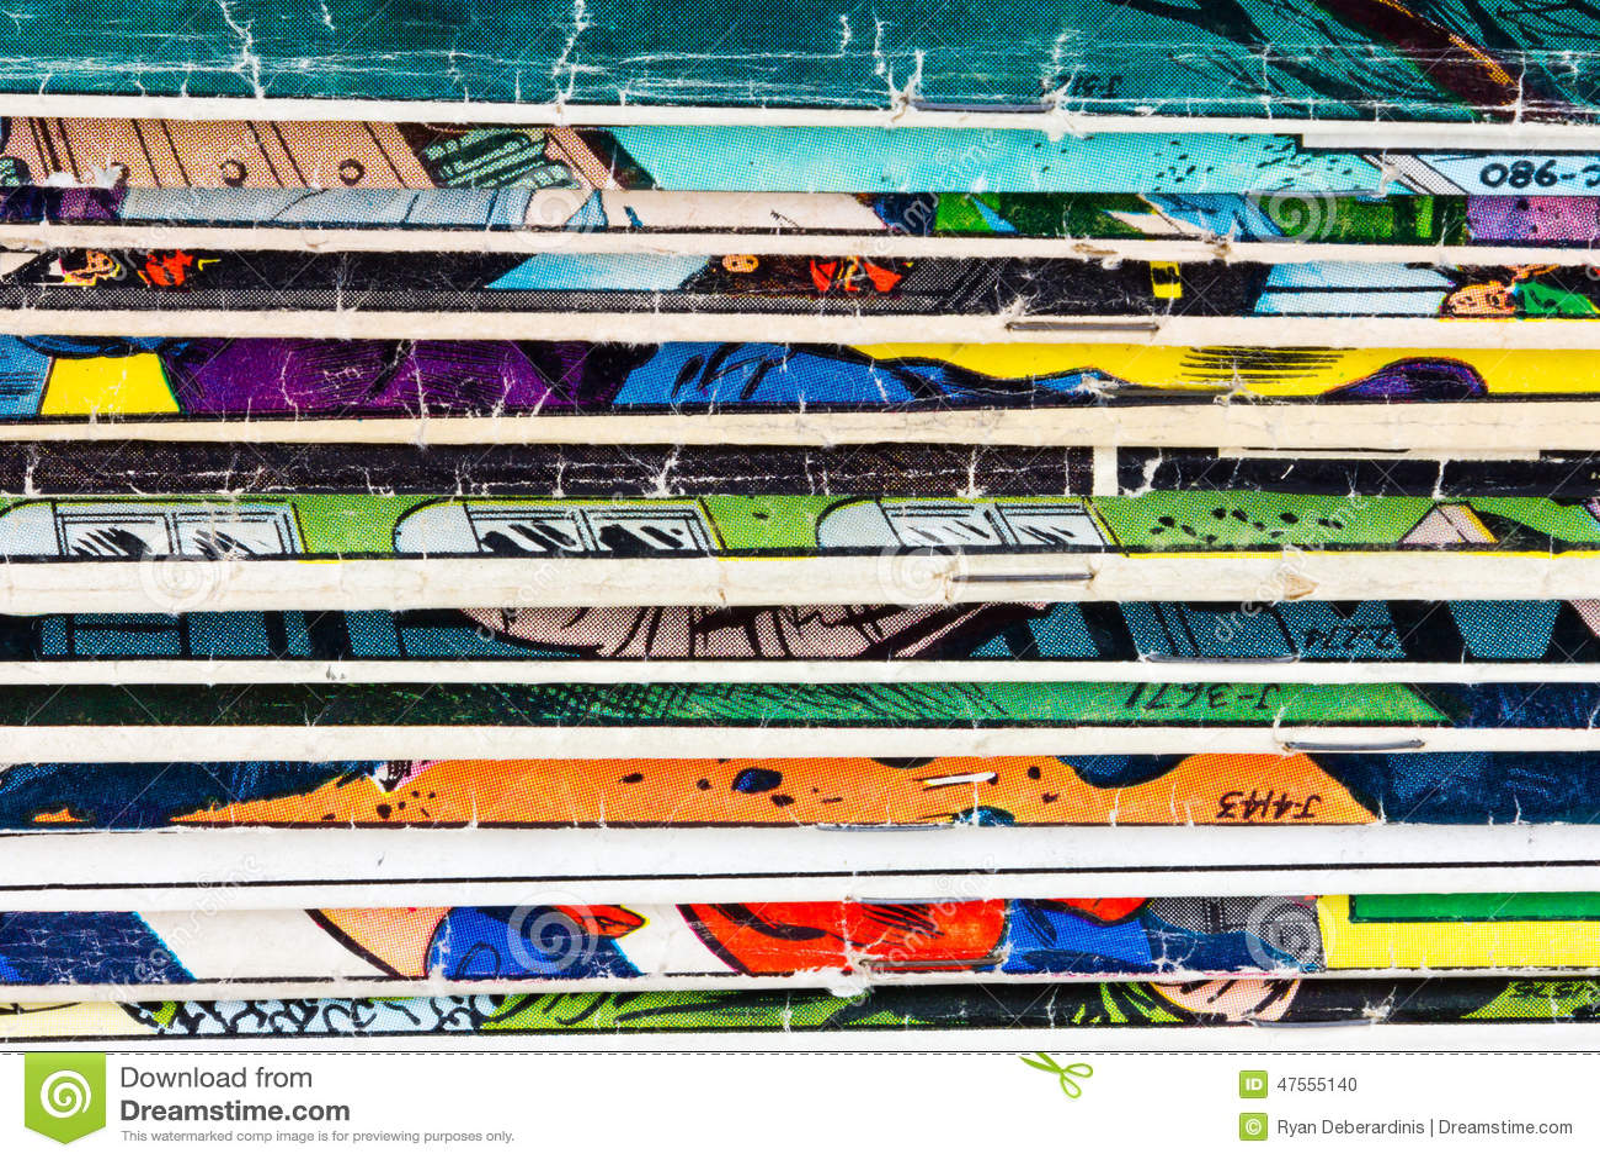 comic book paper texture